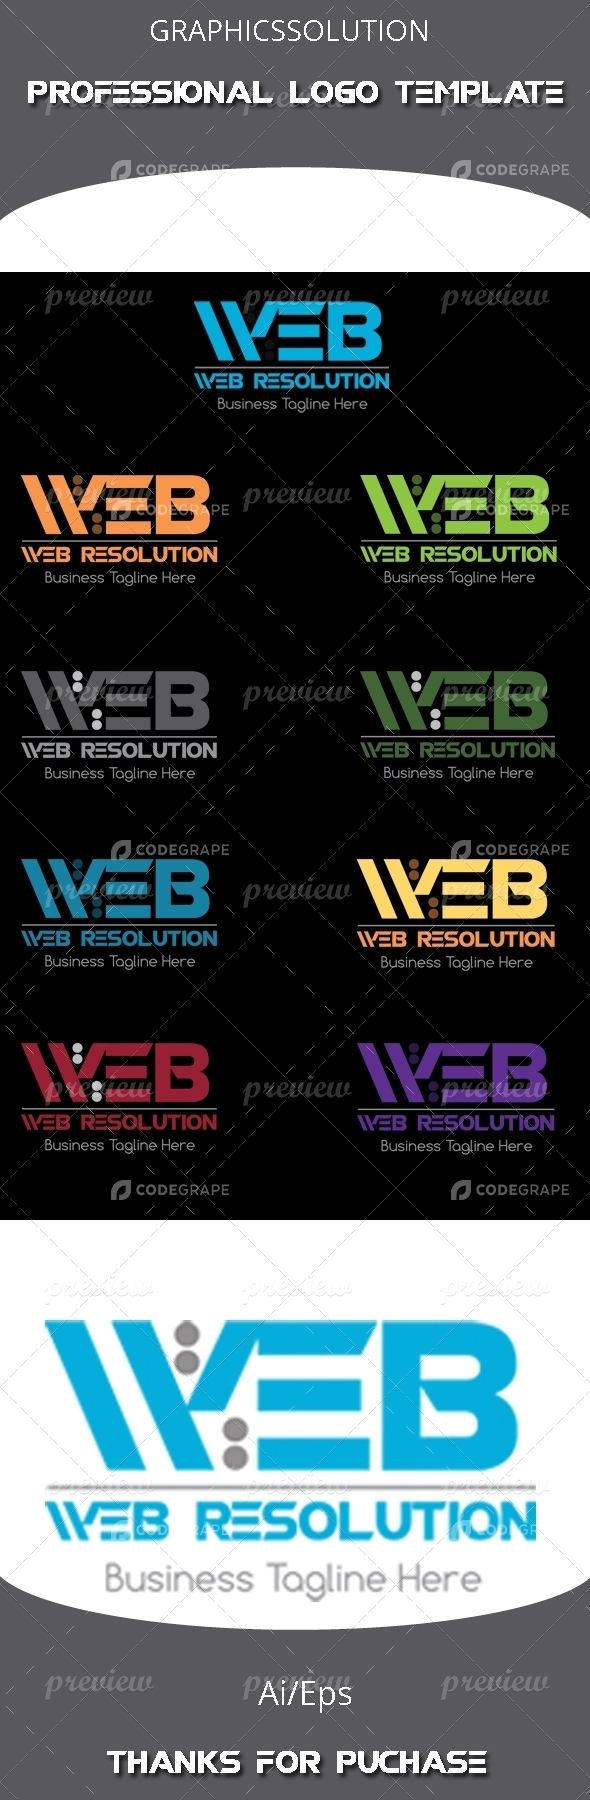 Profession Logo Template